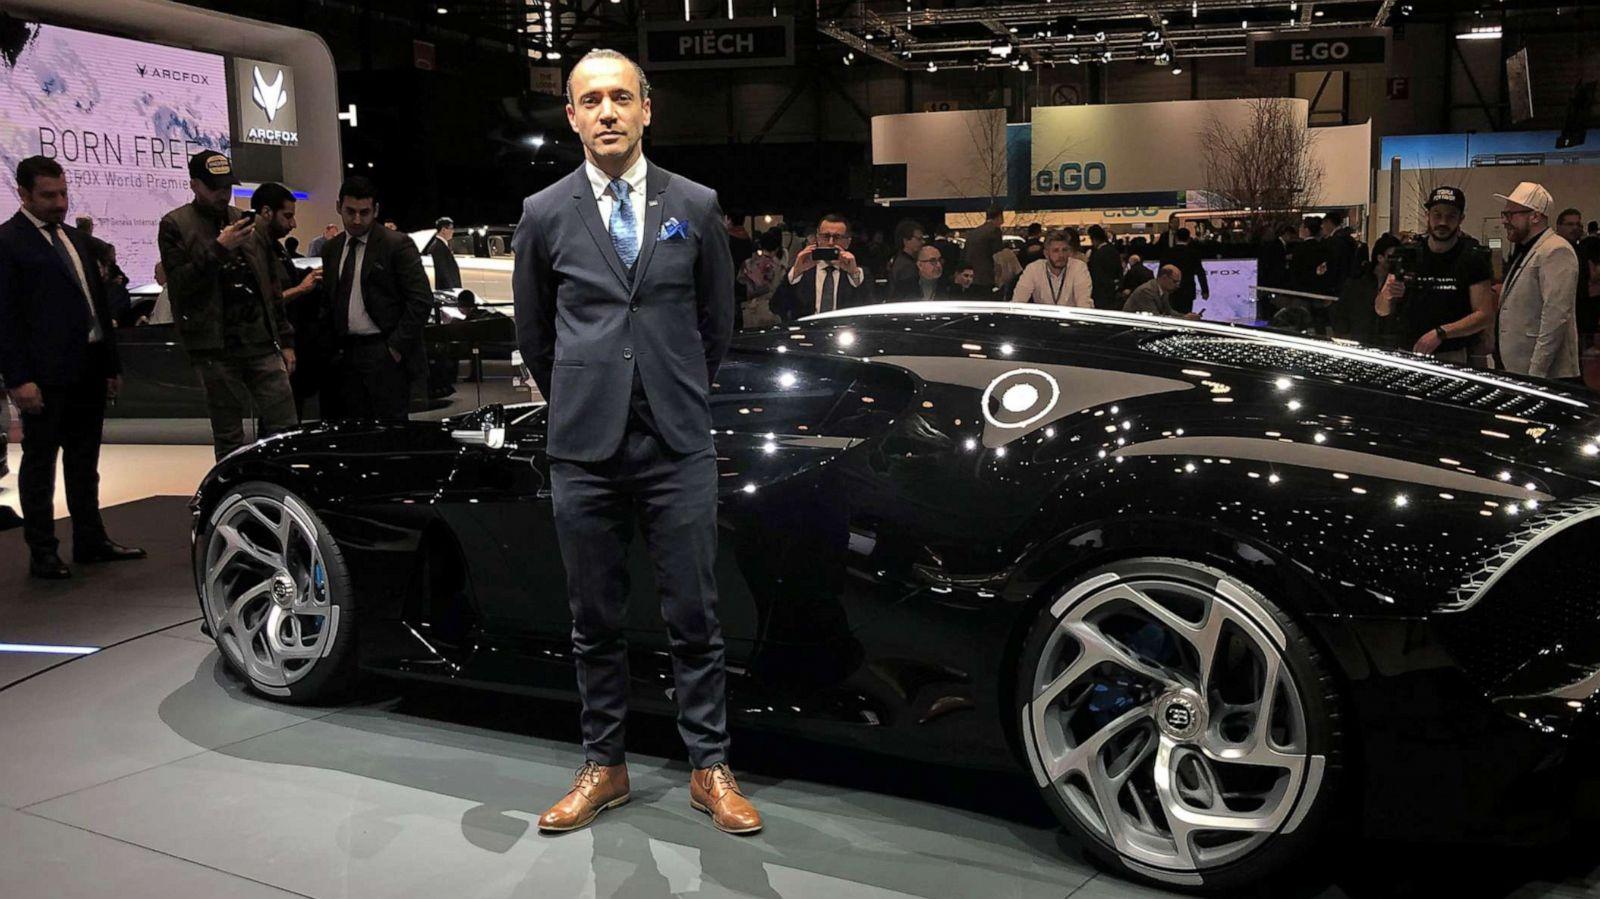 Meet The Designer Of The 19m Bugatti La Voiture Noire The World S Most Expensive New Car Abc News